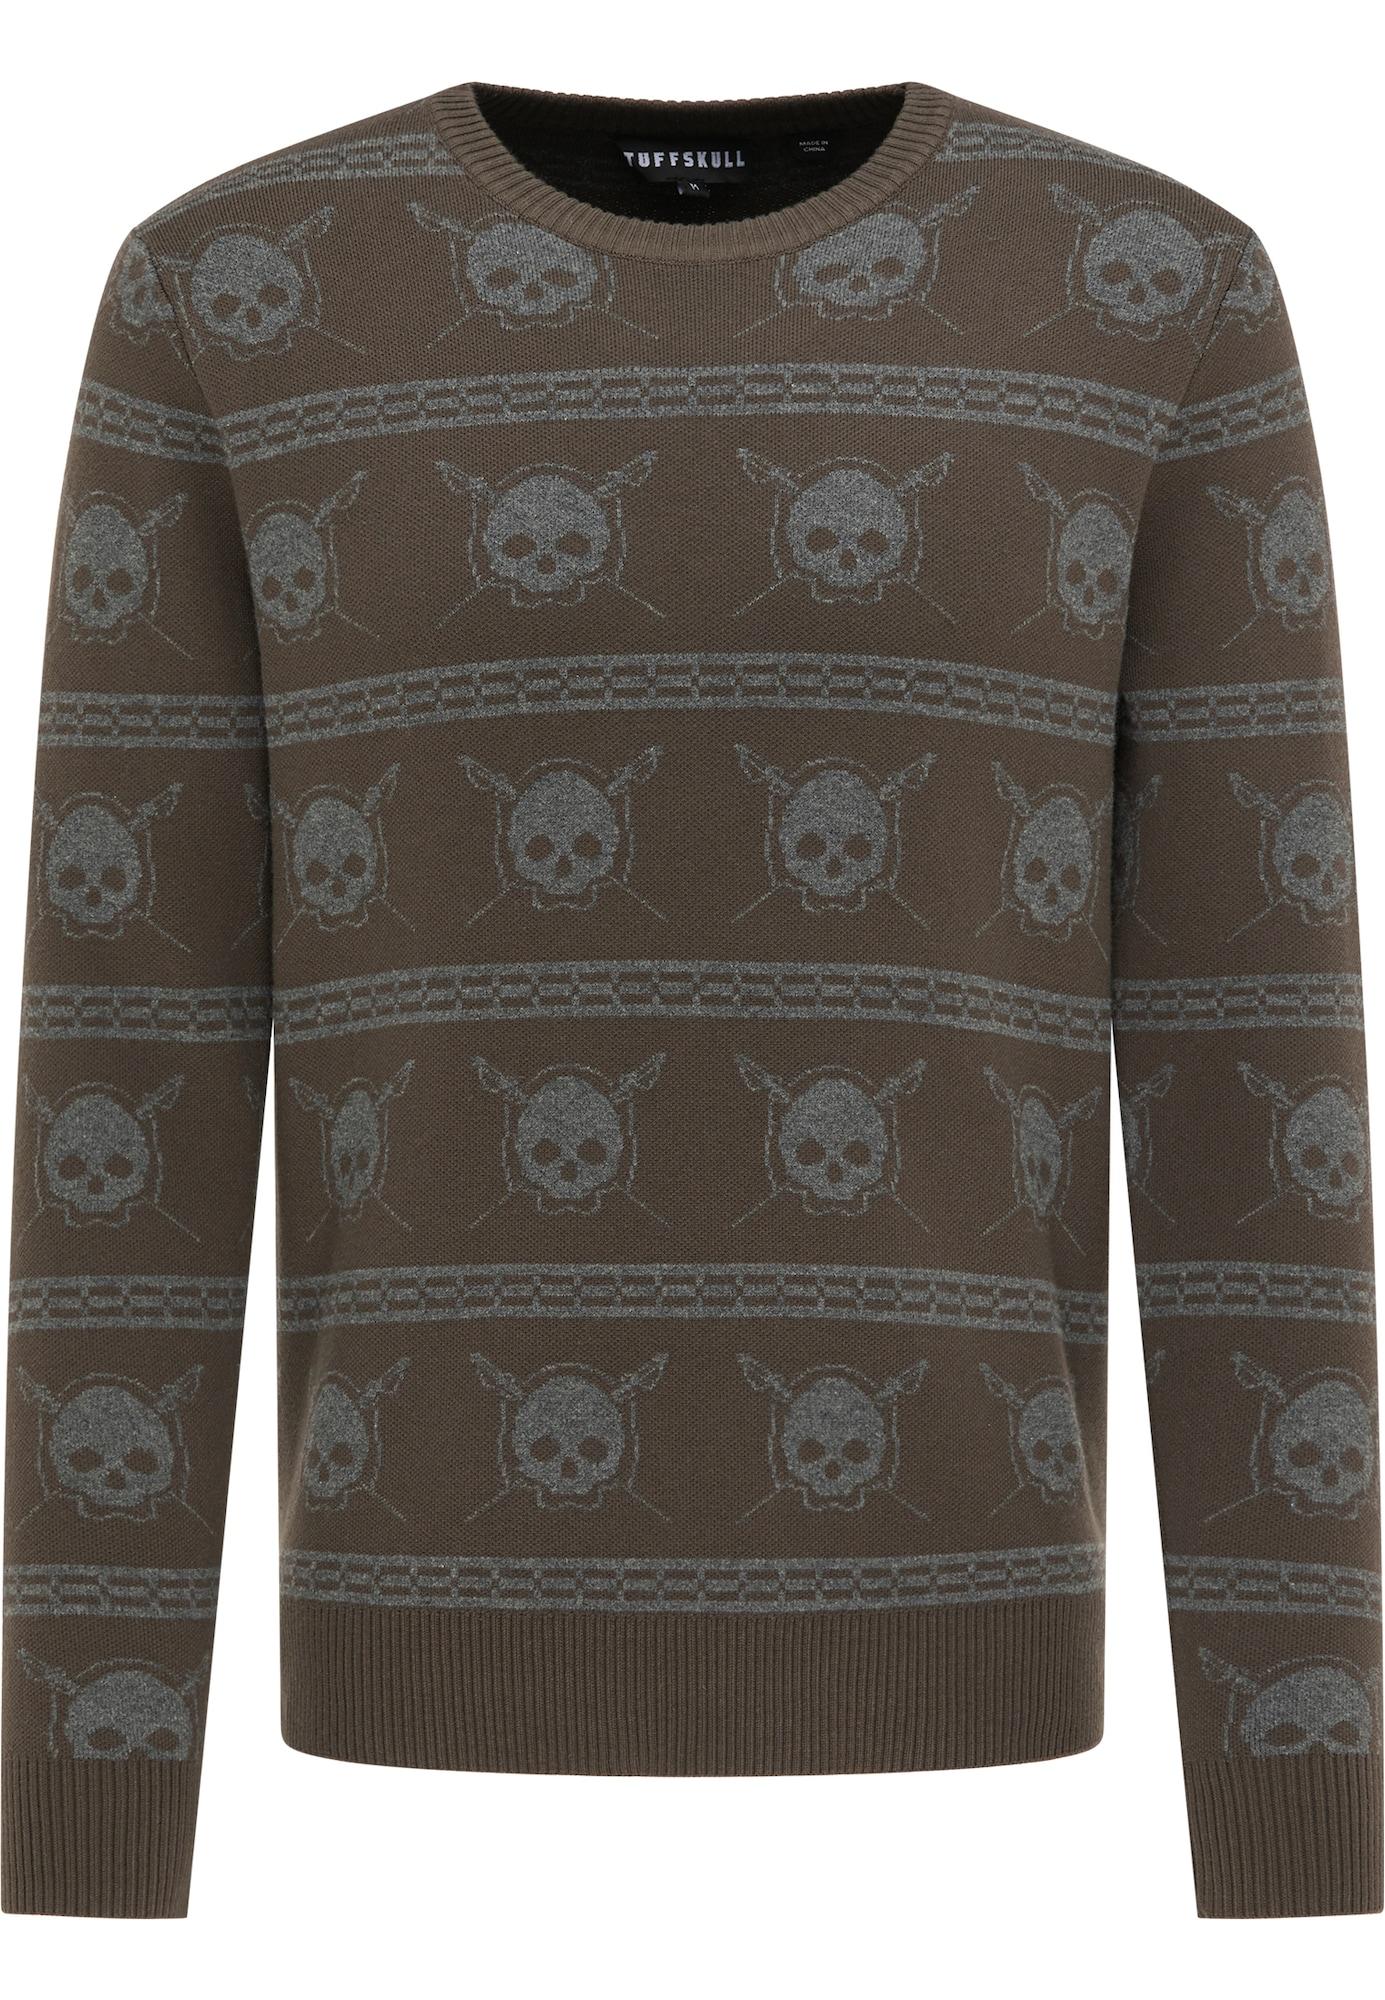 TUFFSKULL Megztinis alyvuogių spalva / rausvai pilka